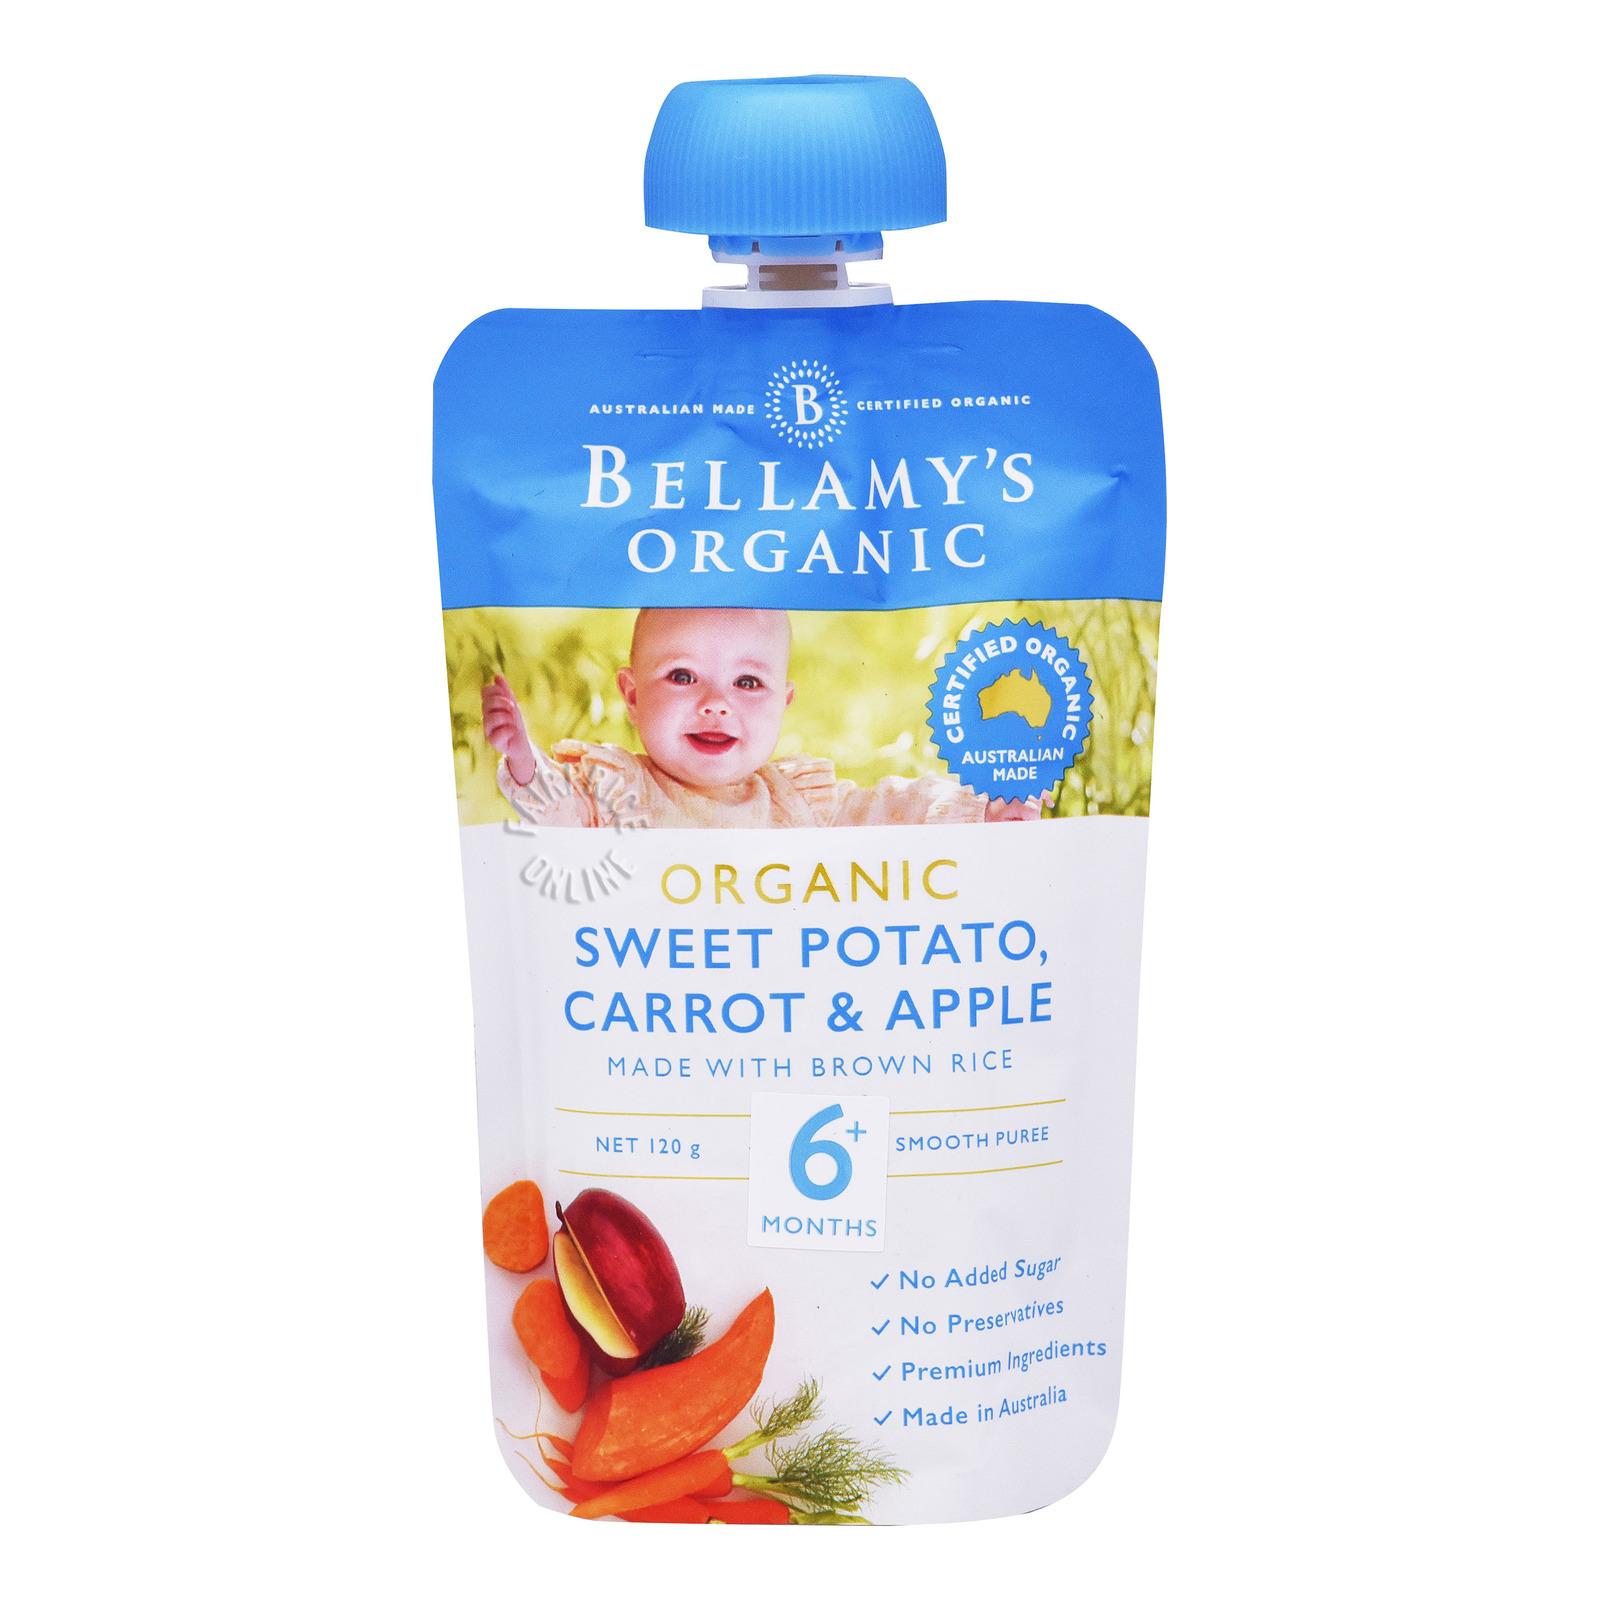 Bellamy's Organic Baby Snack - Sweet Potato, Carrot & Apple